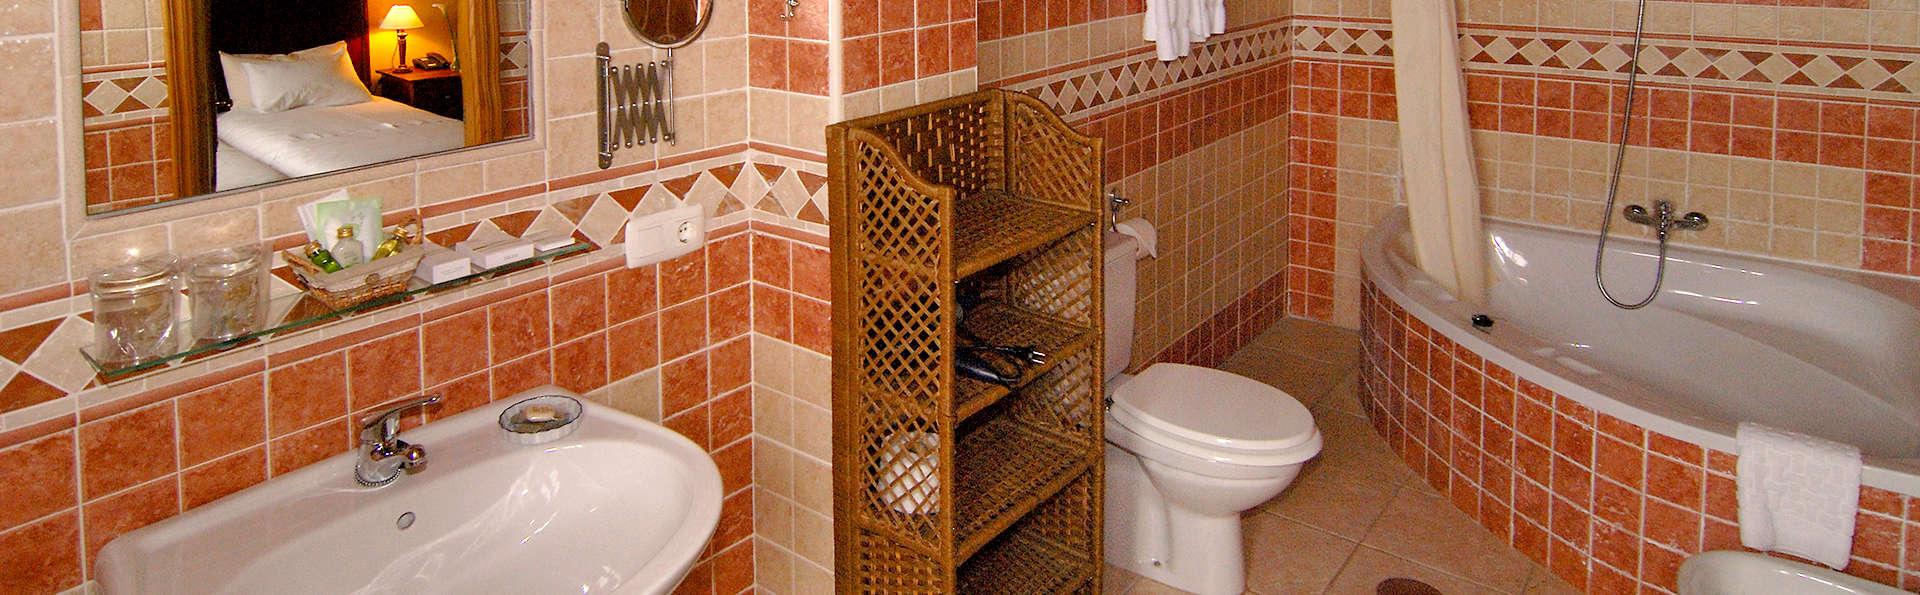 Casa do Merlo - Edit_Bathroom2.jpg